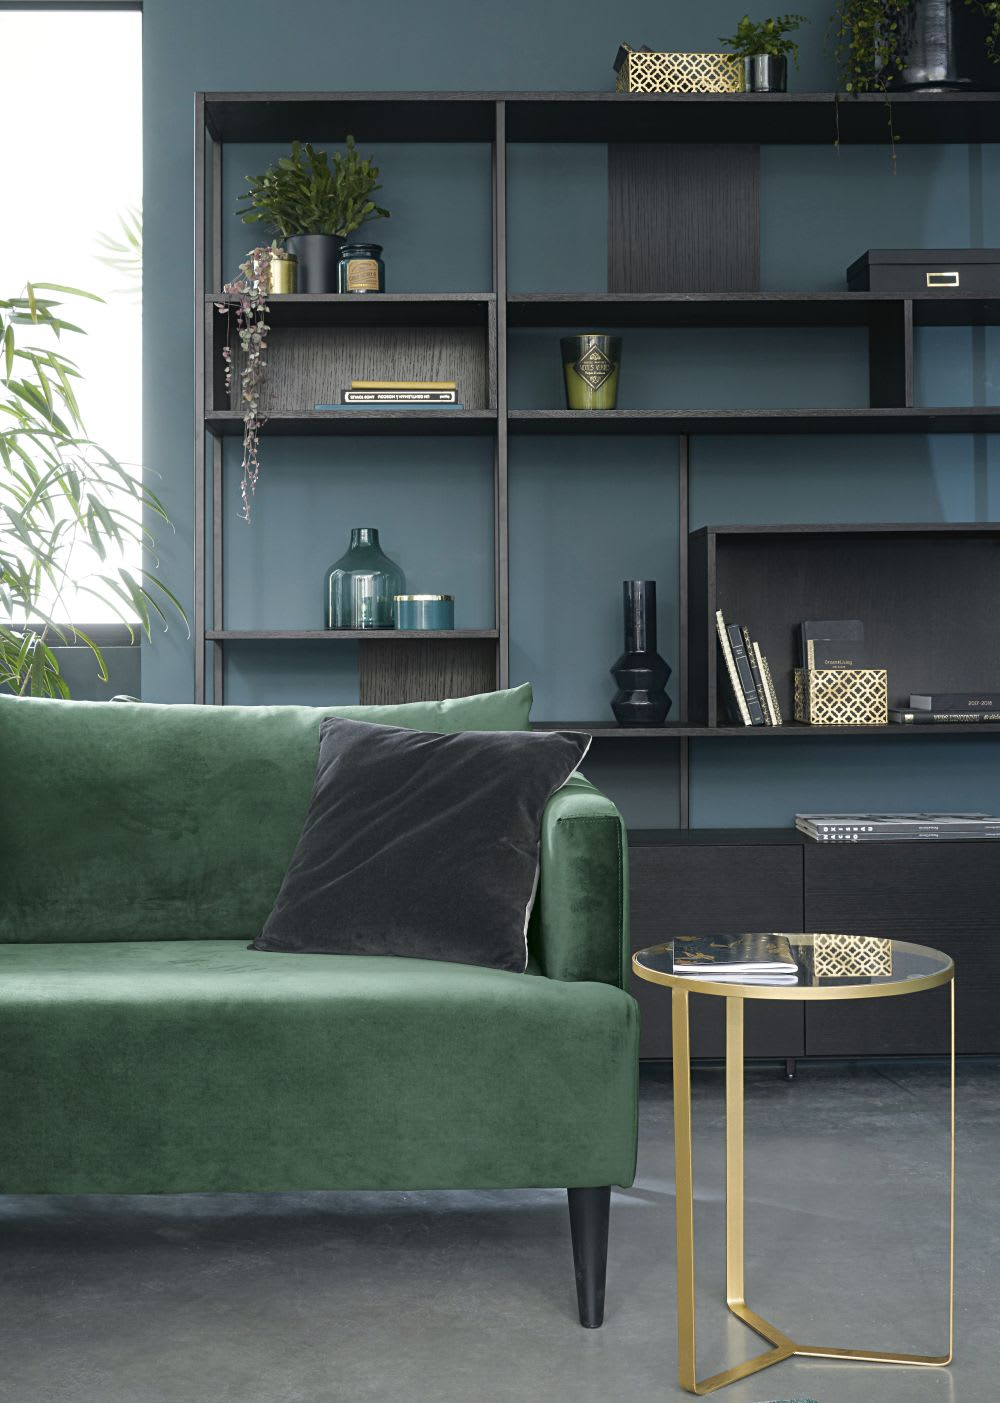 bout de canap en verre et m tal dor olivia maisons du. Black Bedroom Furniture Sets. Home Design Ideas